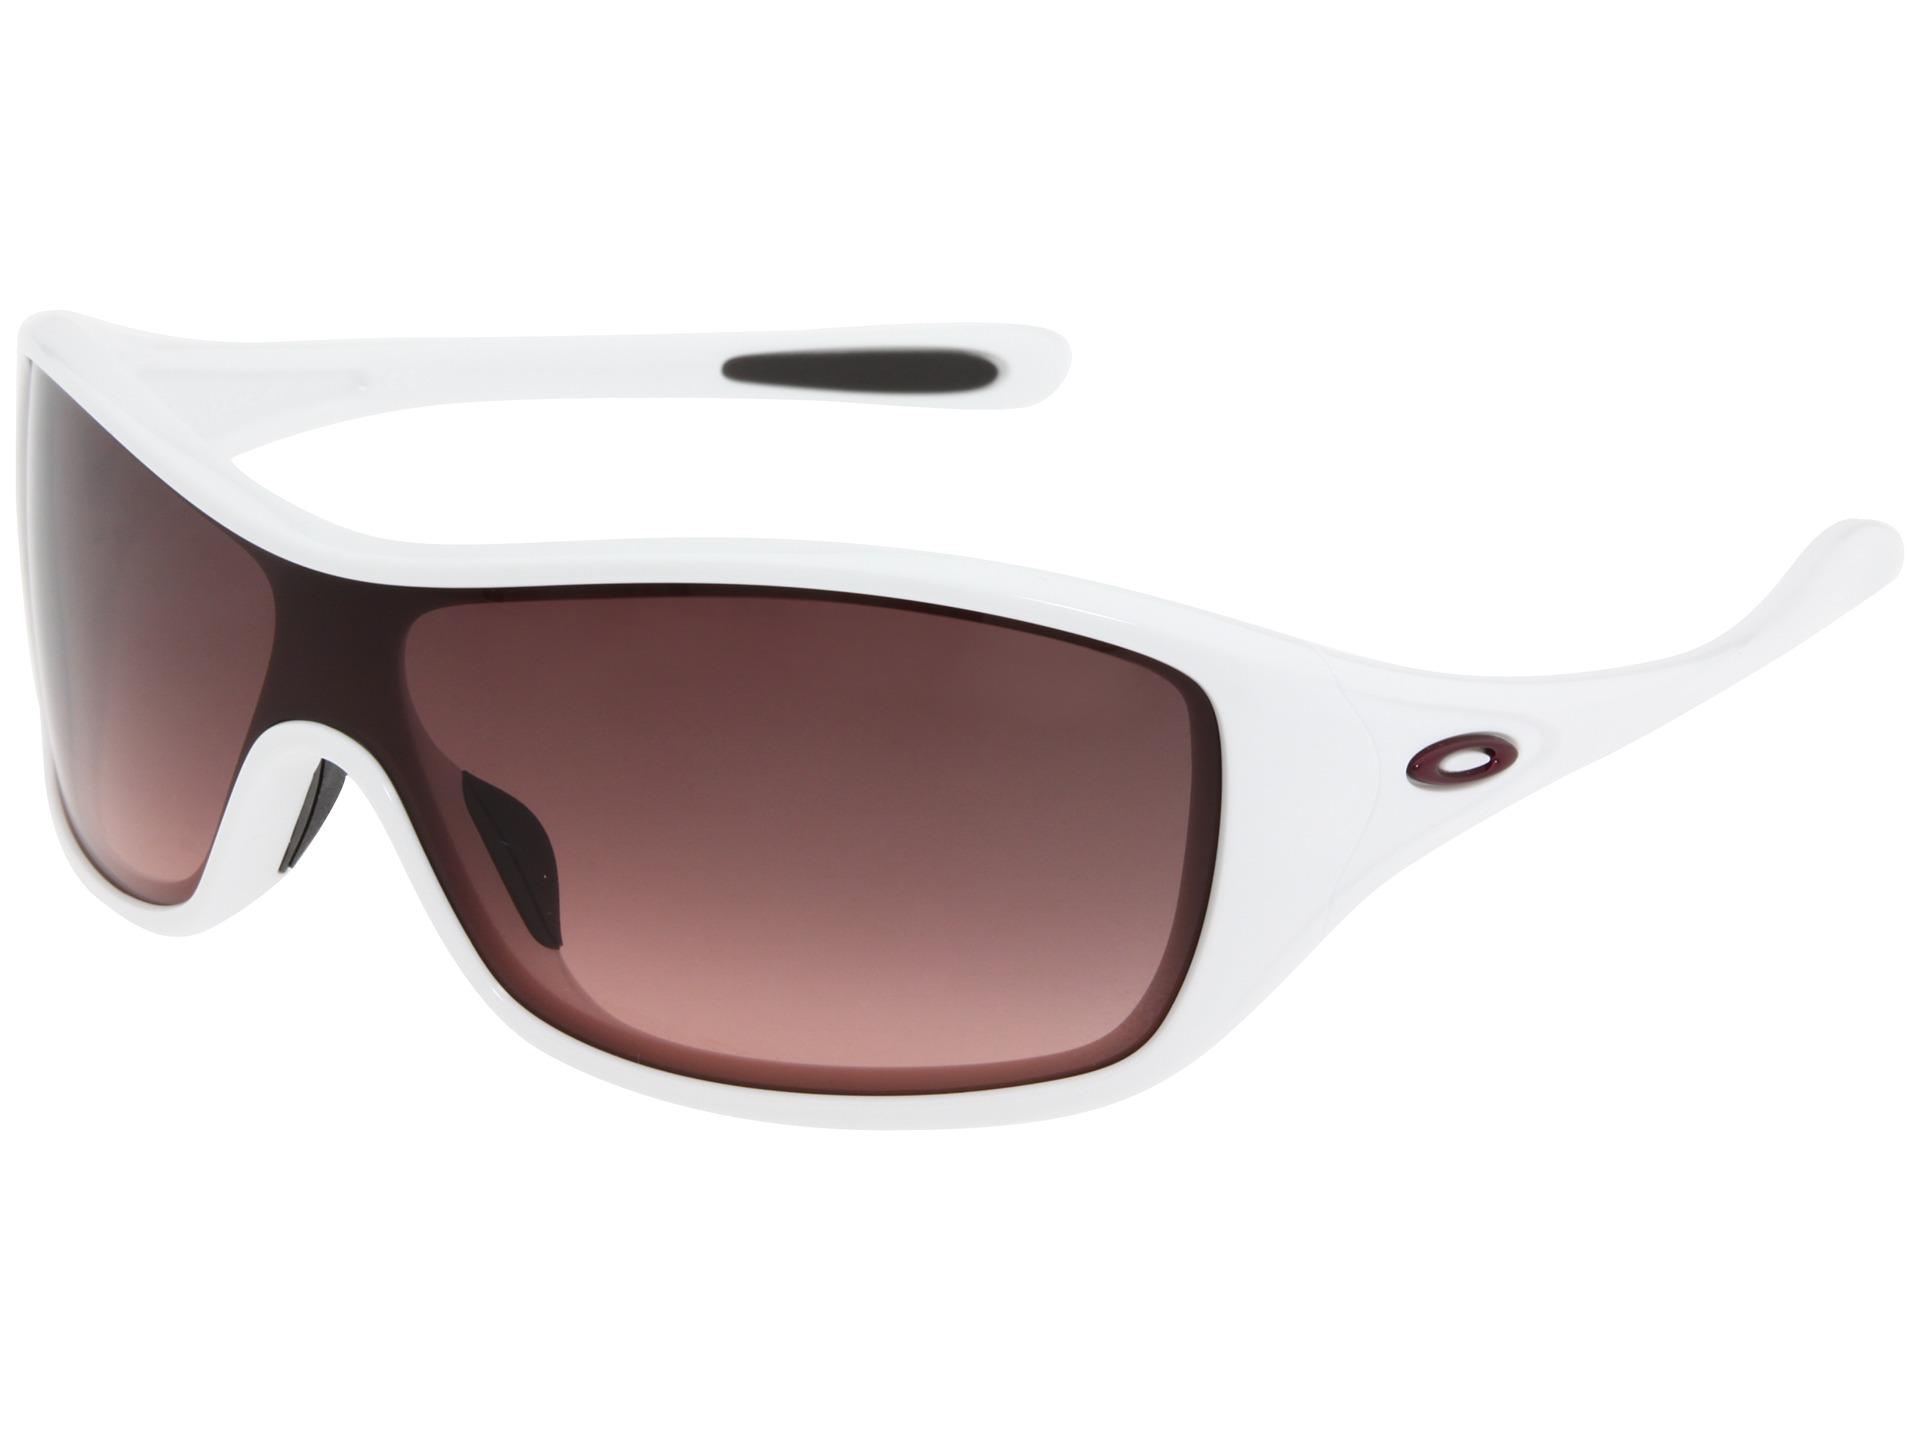 c7b9819246b Oakley Ladies Golf Sunglasses « Heritage Malta